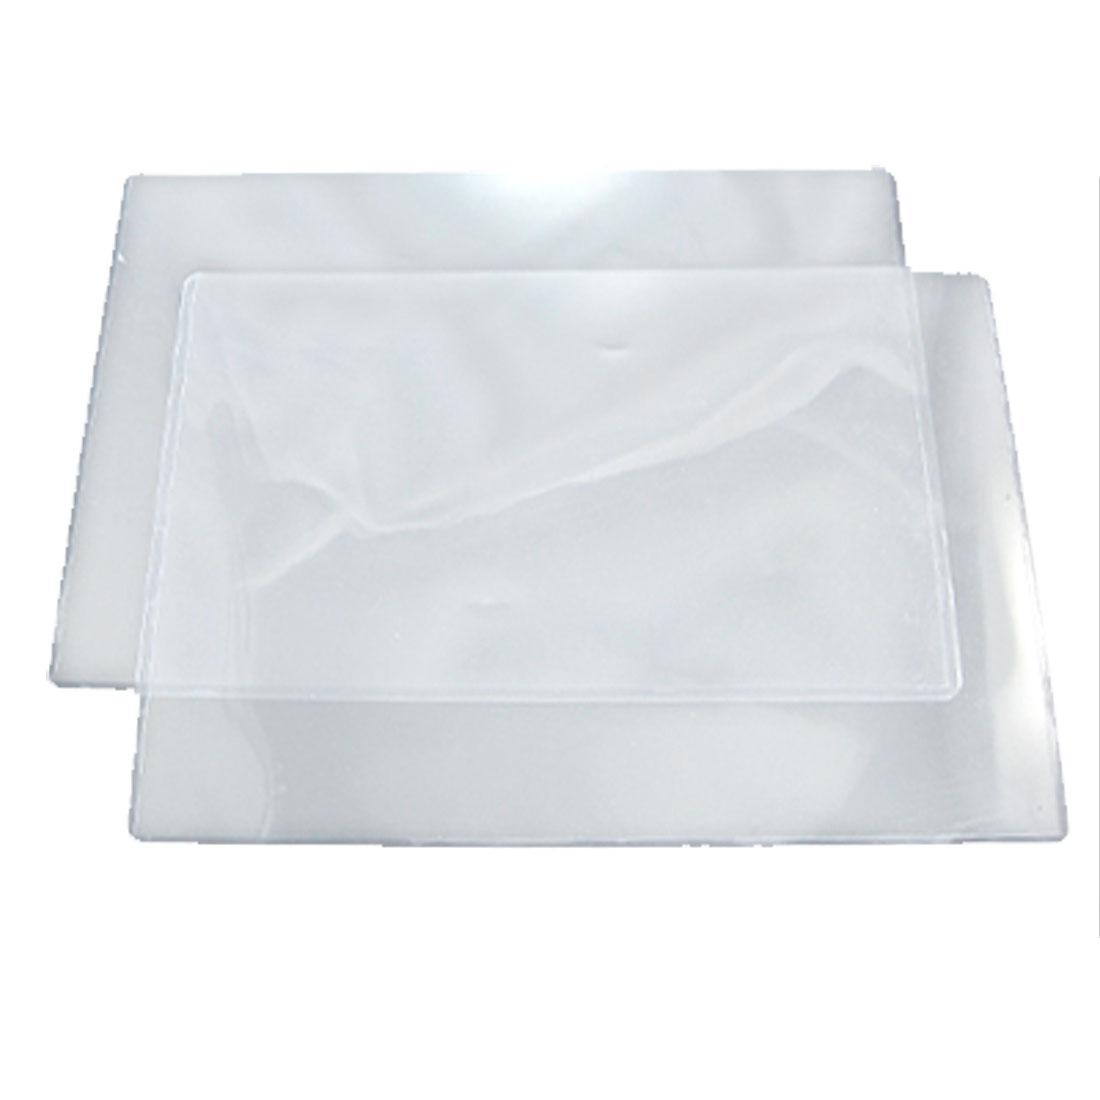 2 Pcs Clear Plastic Holder A4 Document Files Photos Cards Storage Case